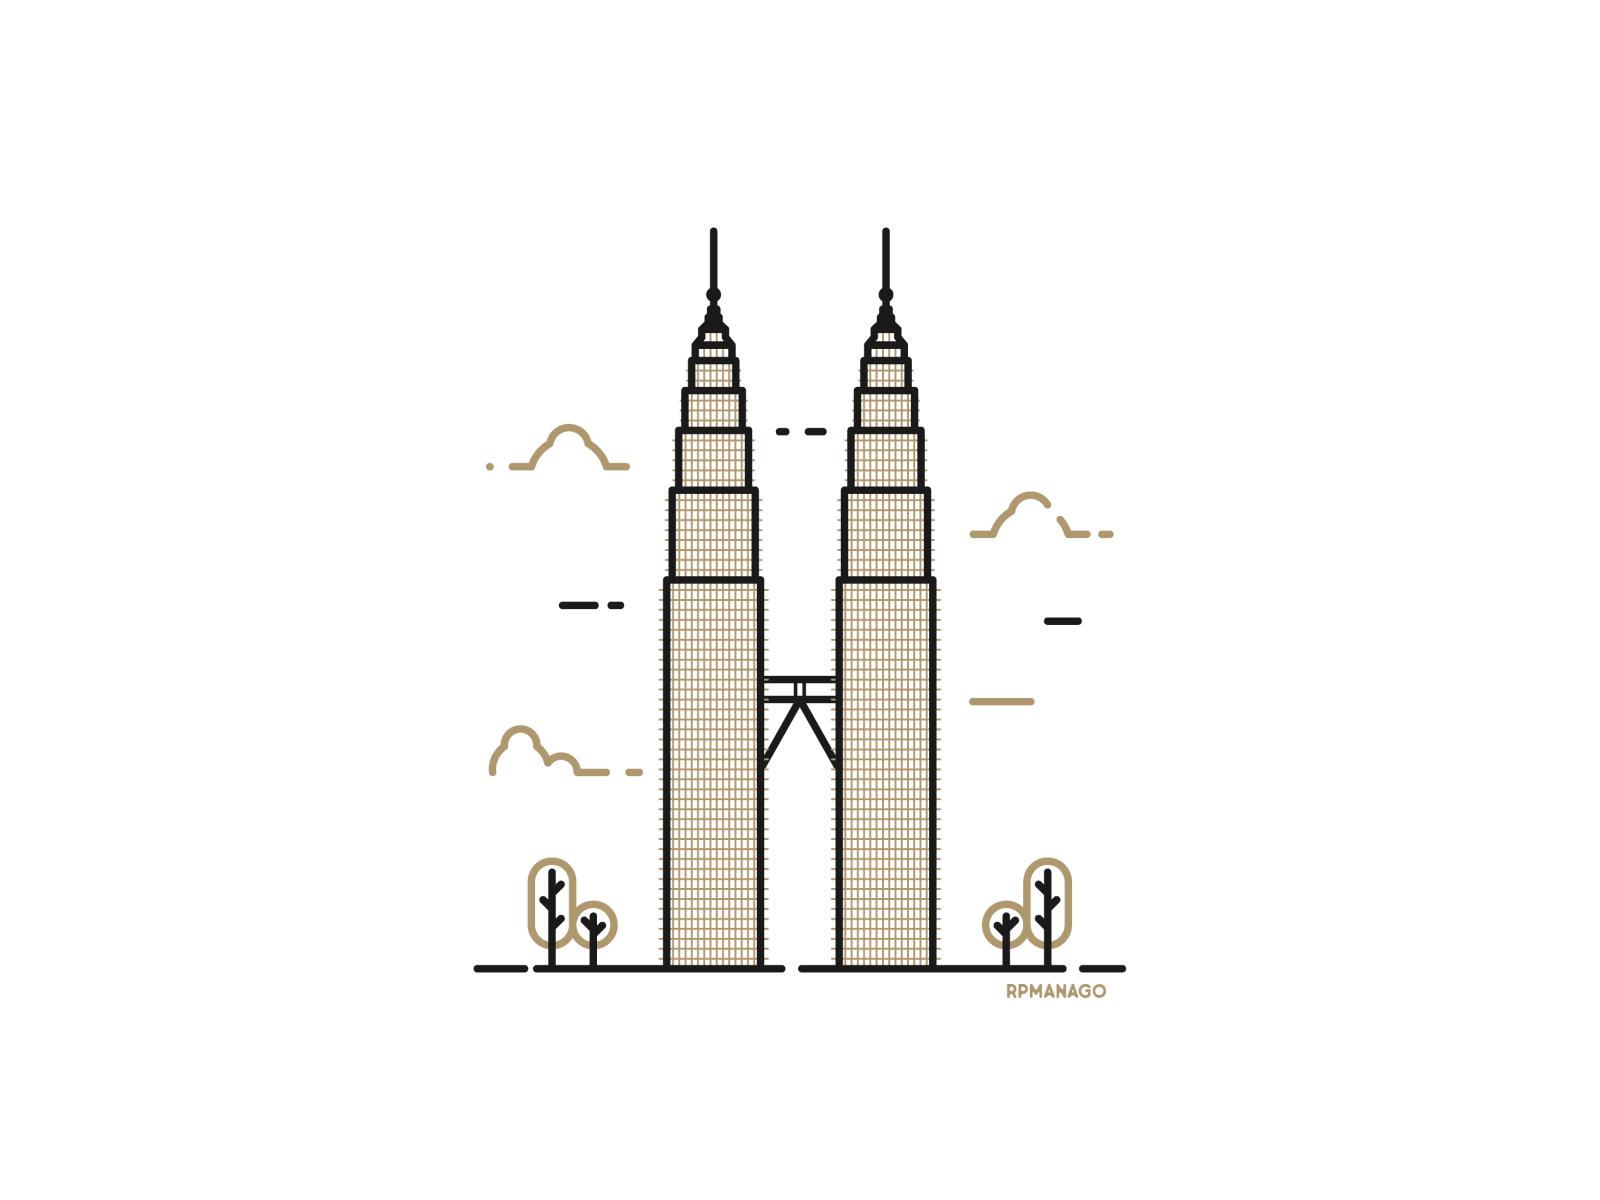 Kuala Lumpur Malaysia Petronas Twin Towers By Rosemarie Manago On Dribbble